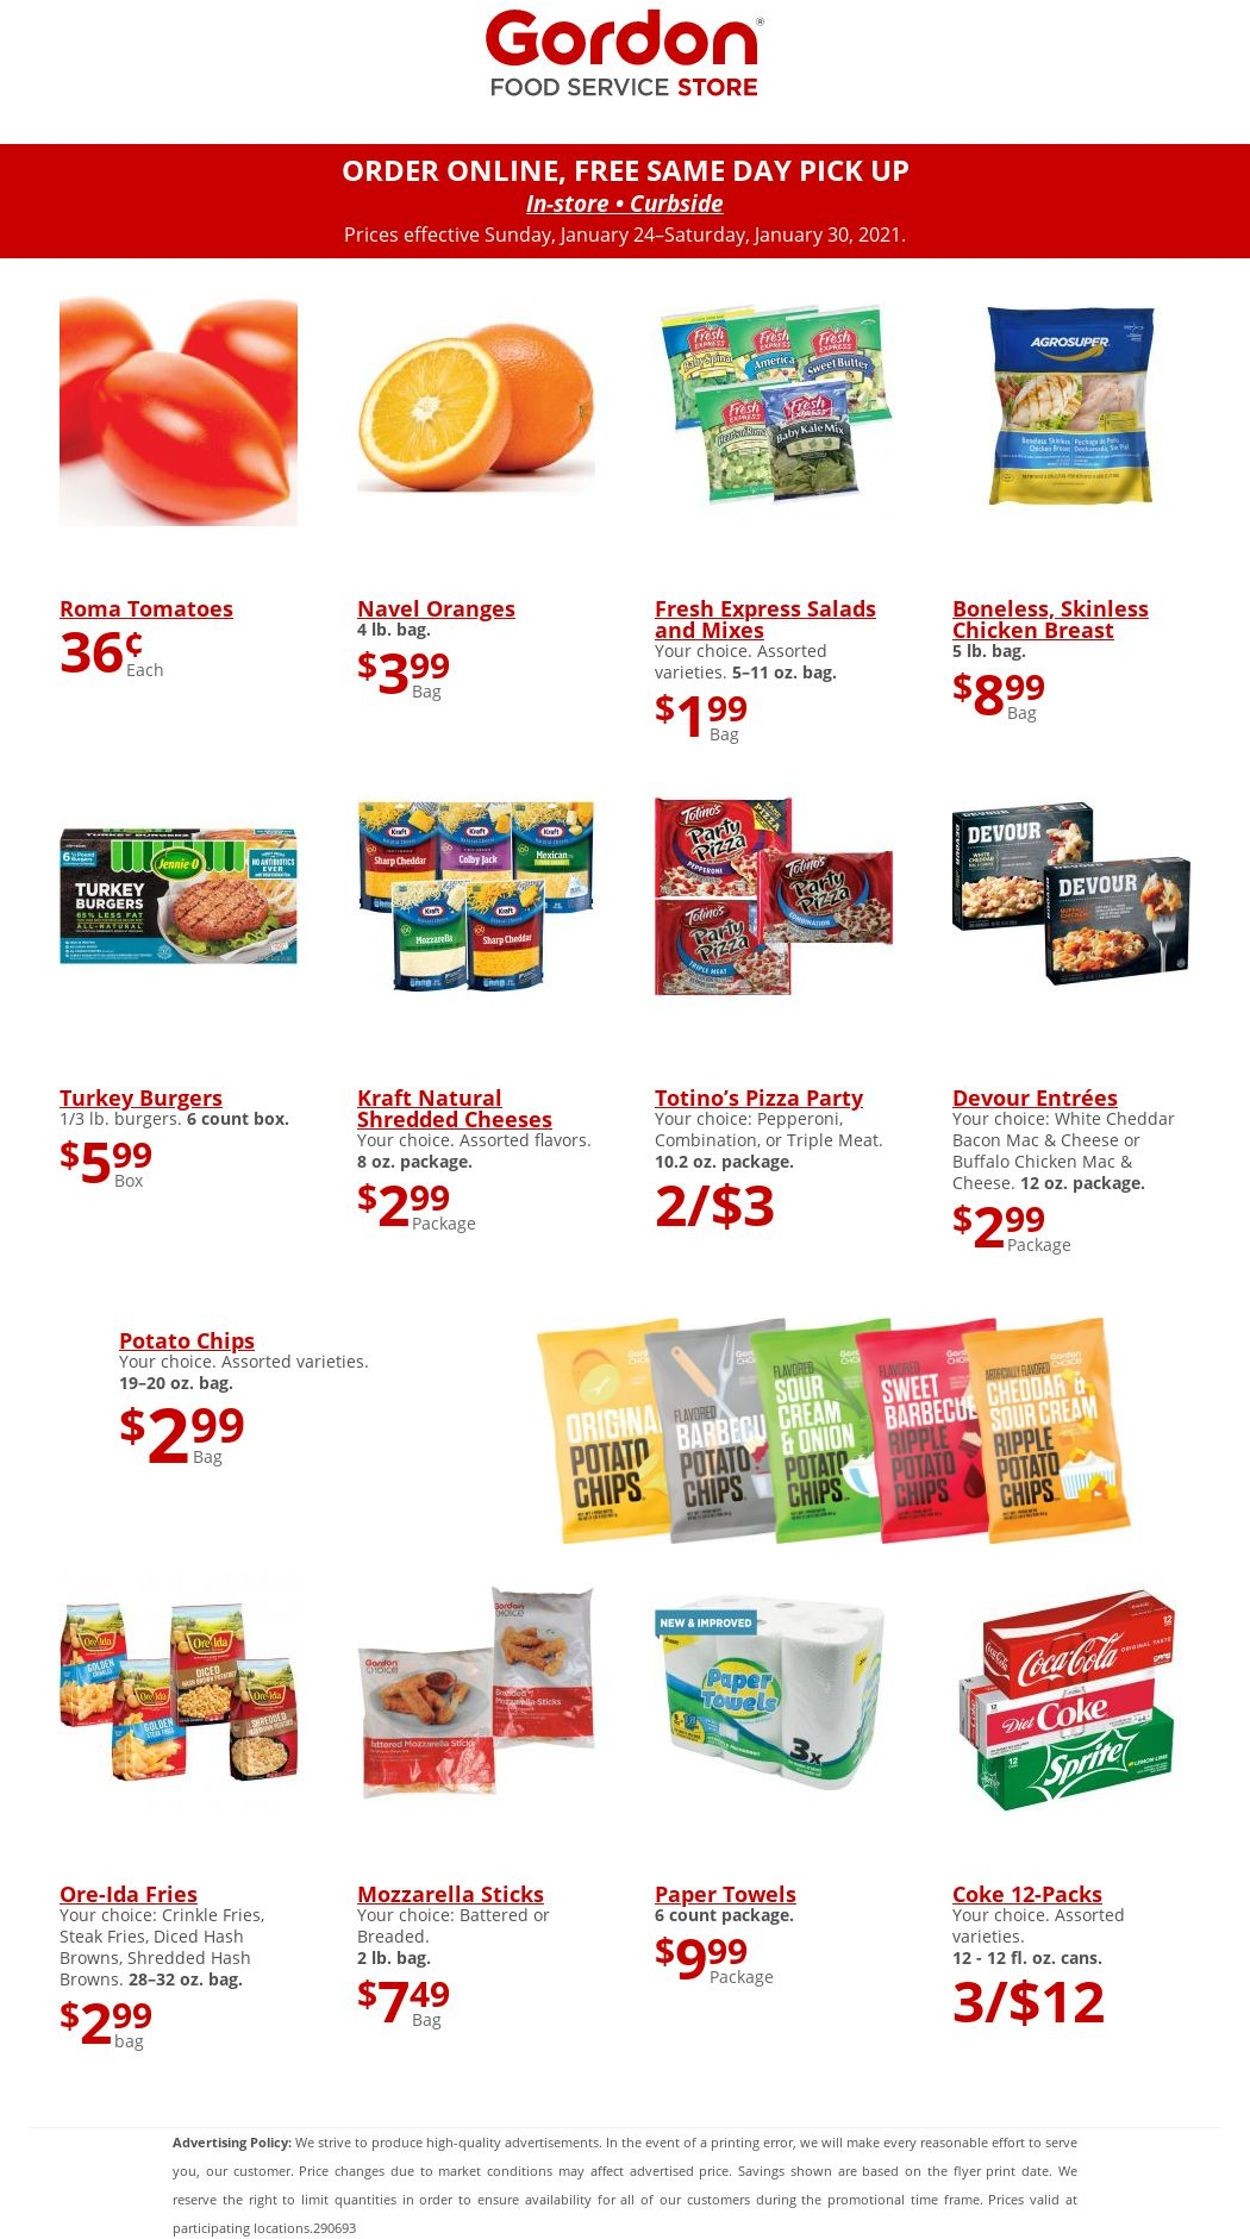 Gordon Food Service Store Weekly Ad Circular - valid 01/24-01/30/2021